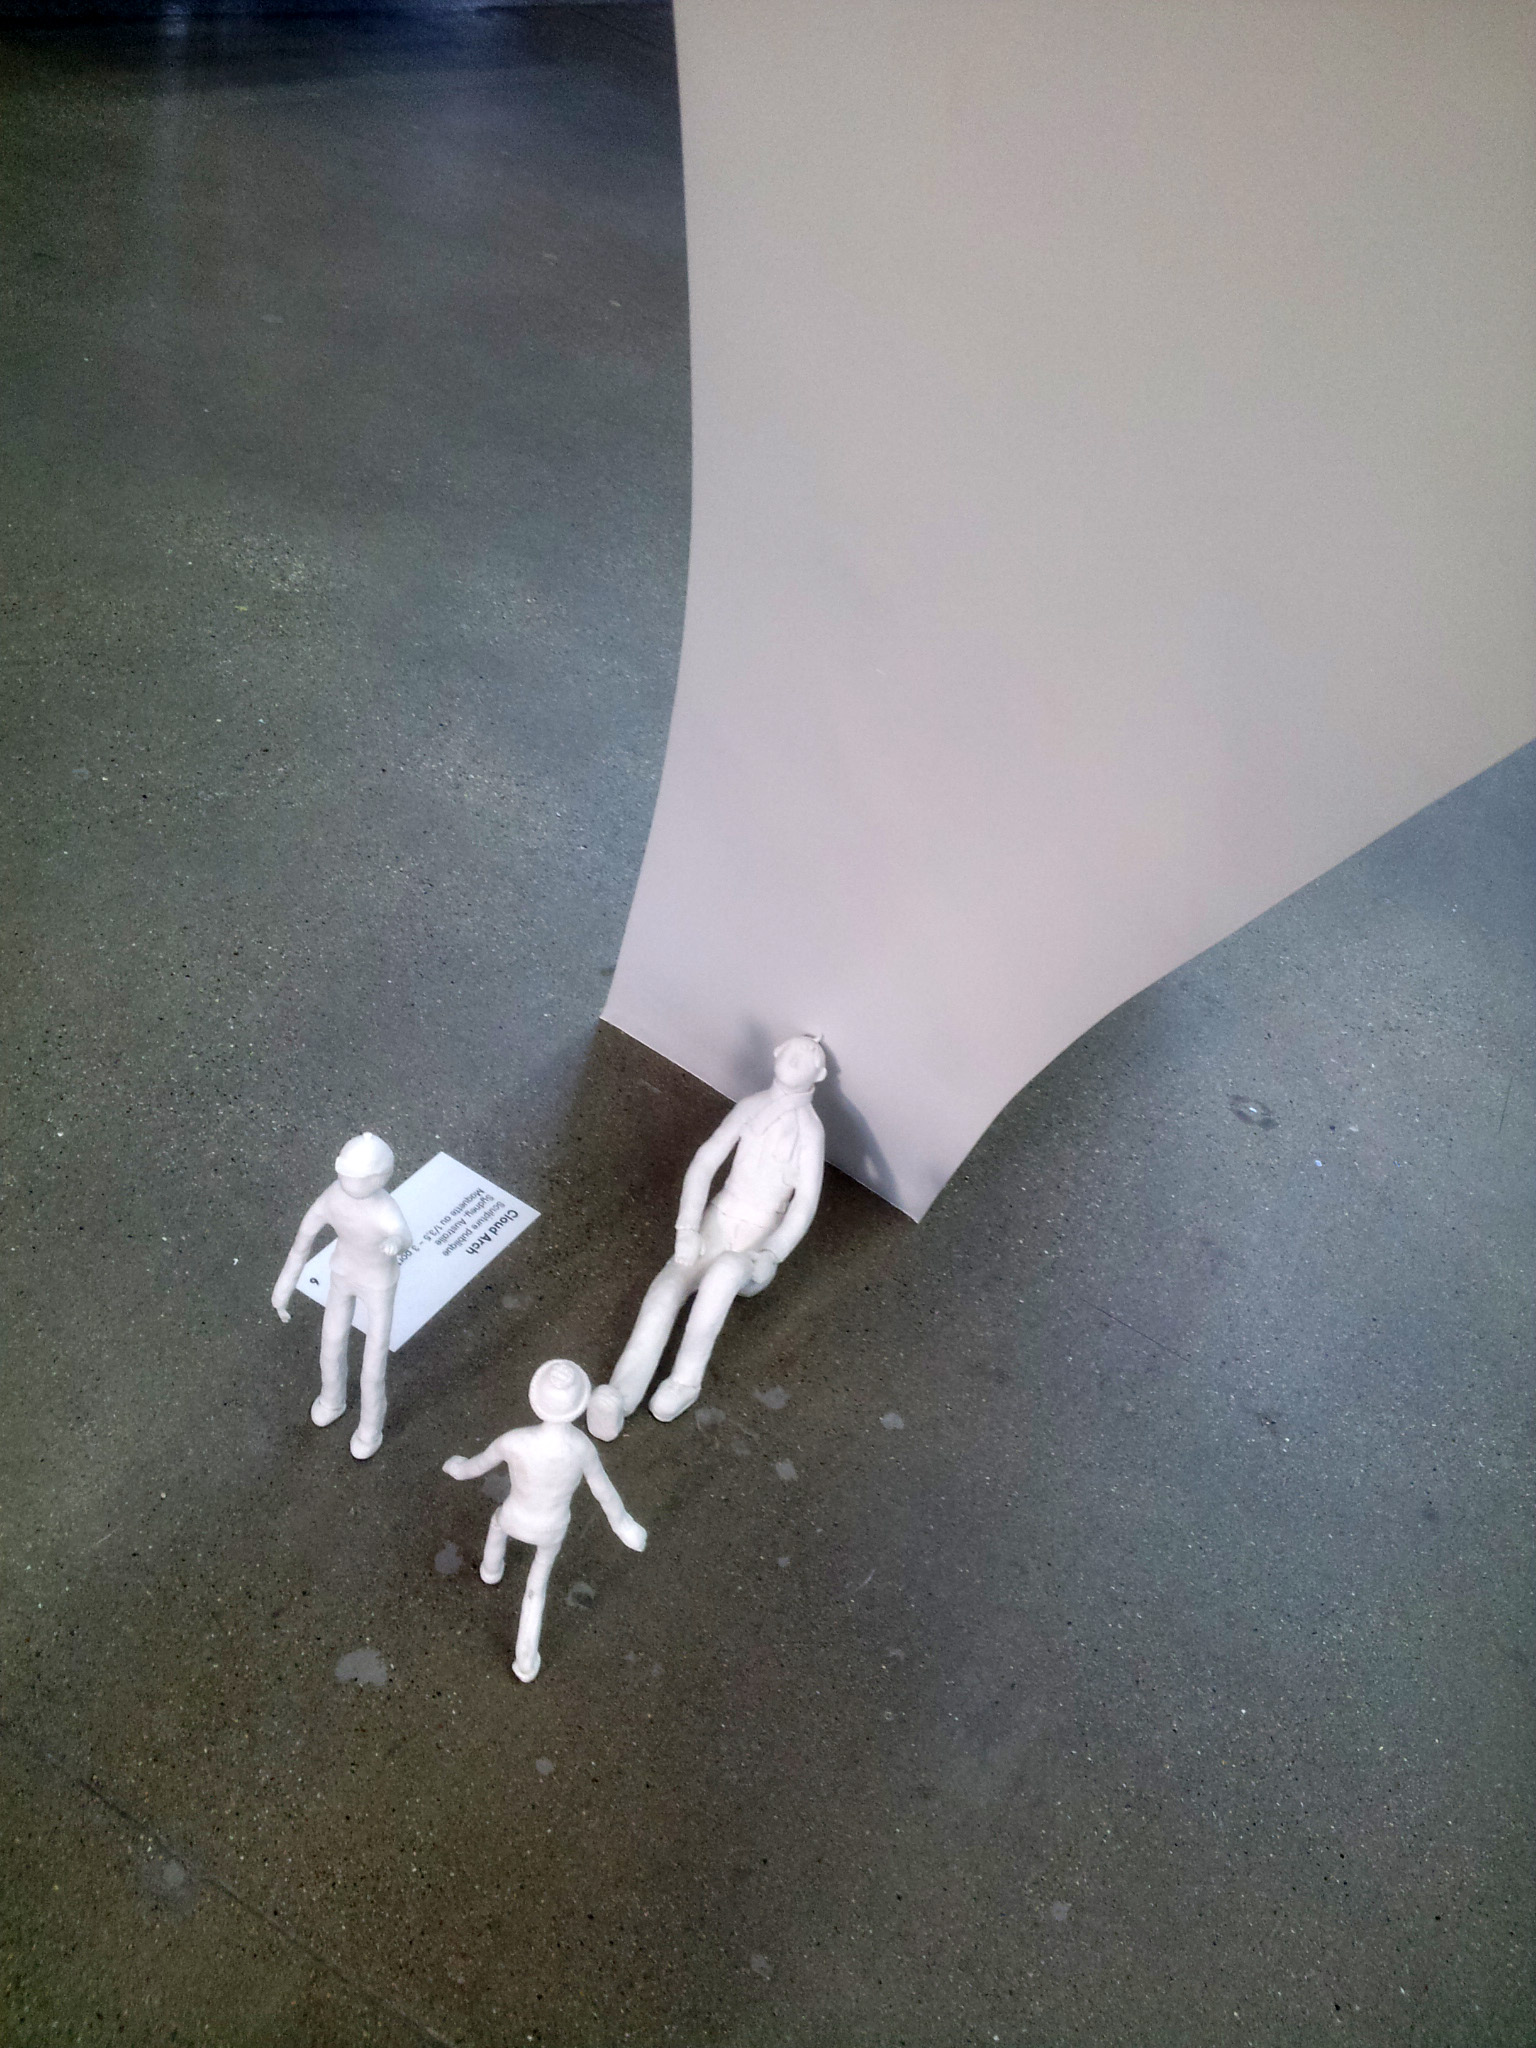 Junya-Ishigami-Freeing-Architecture-09